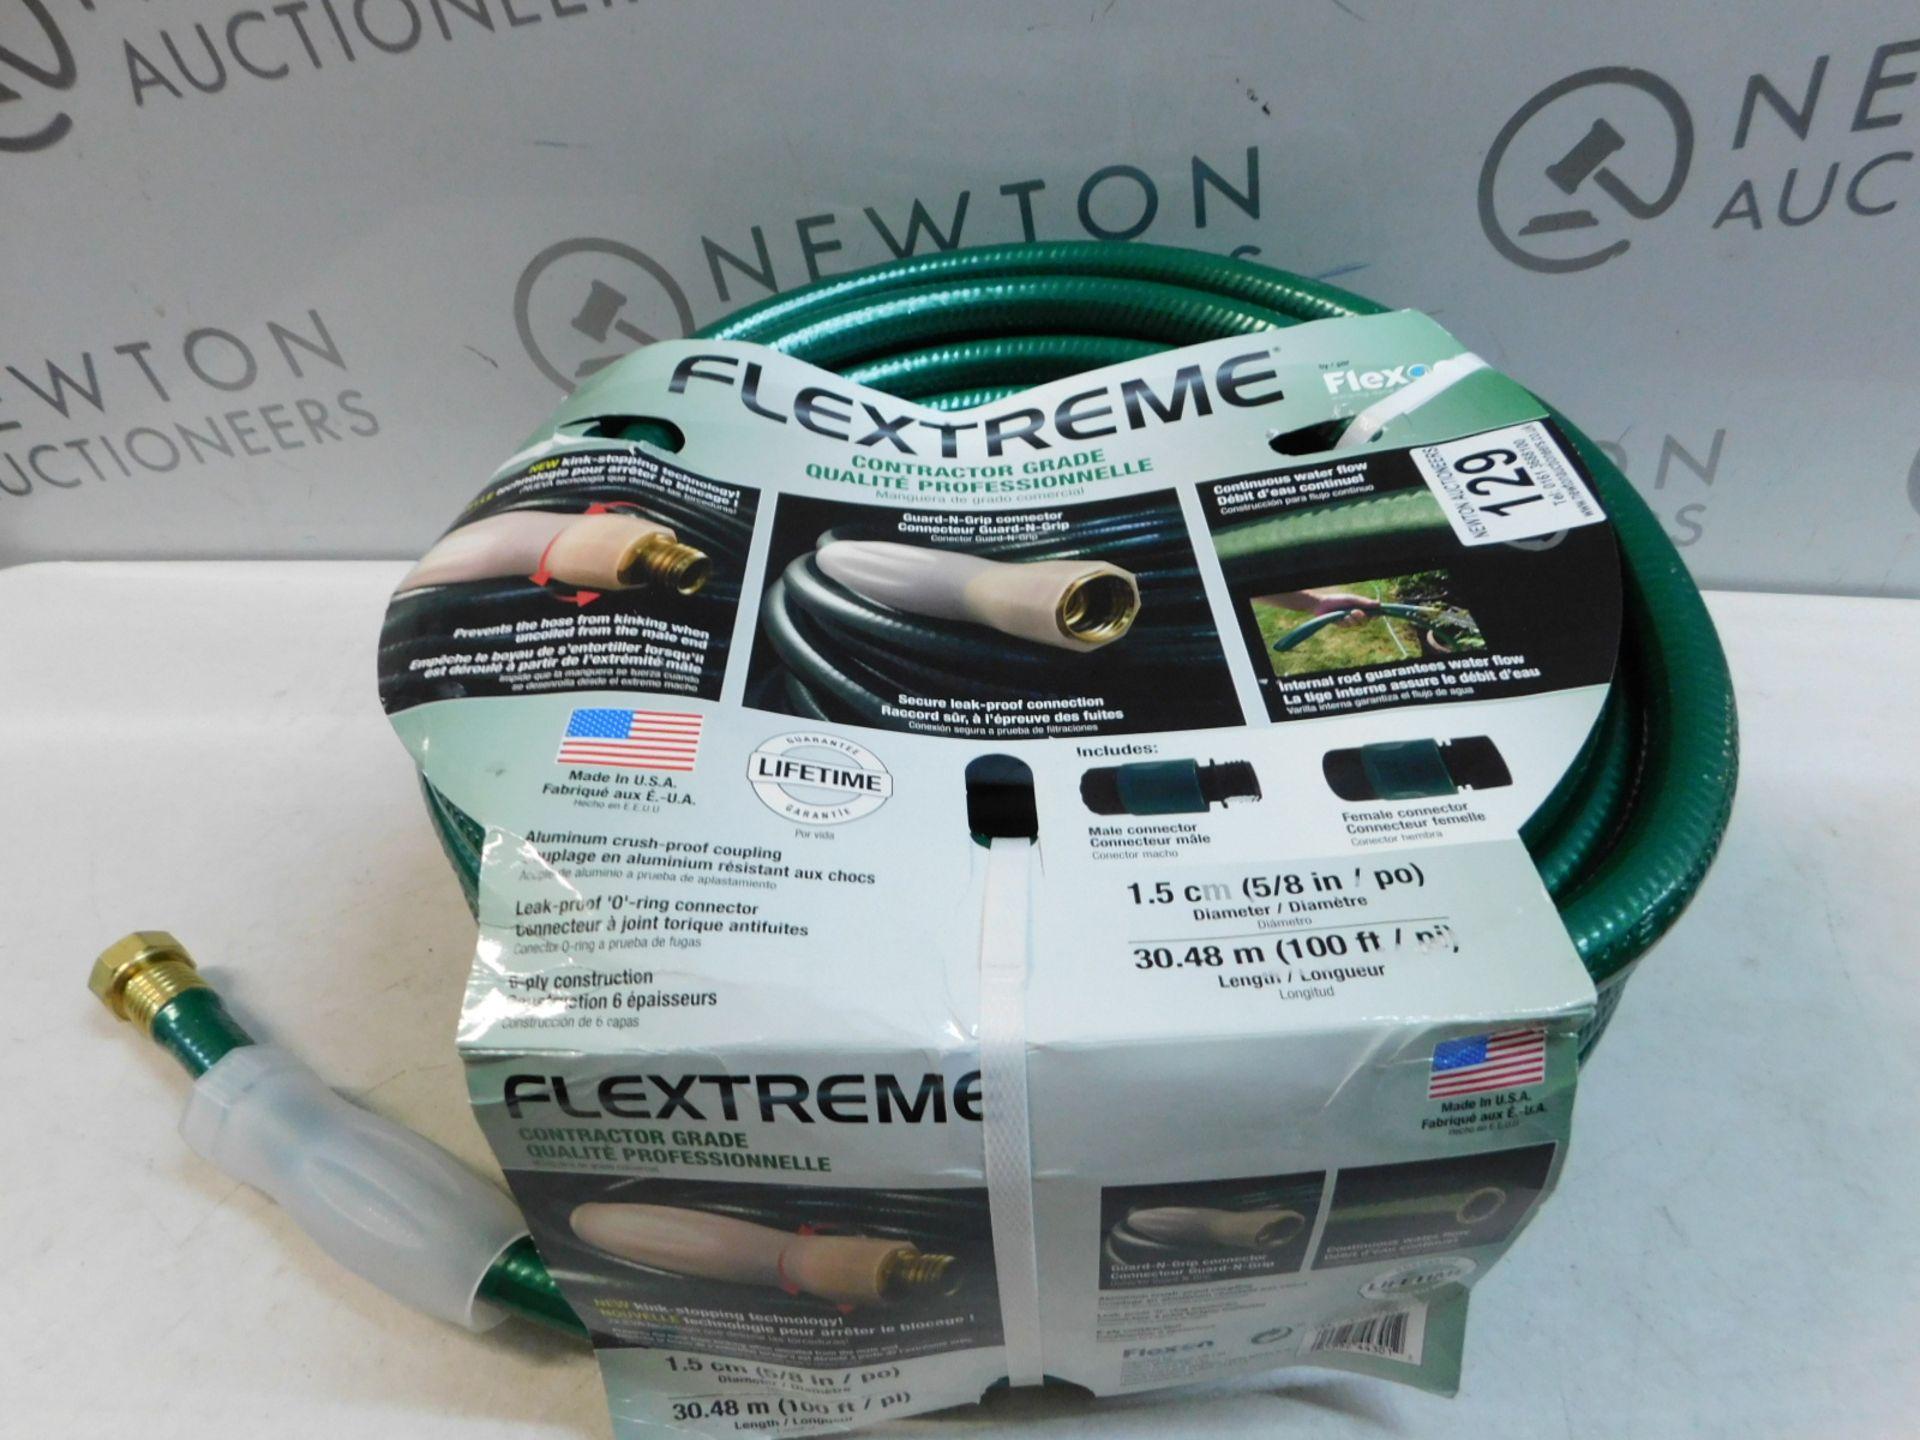 Lot 129 - 1 PACK OF FLEXON 100FT PROFESSIONAL COMMERCIAL GRADE HOSE RRP £89.99